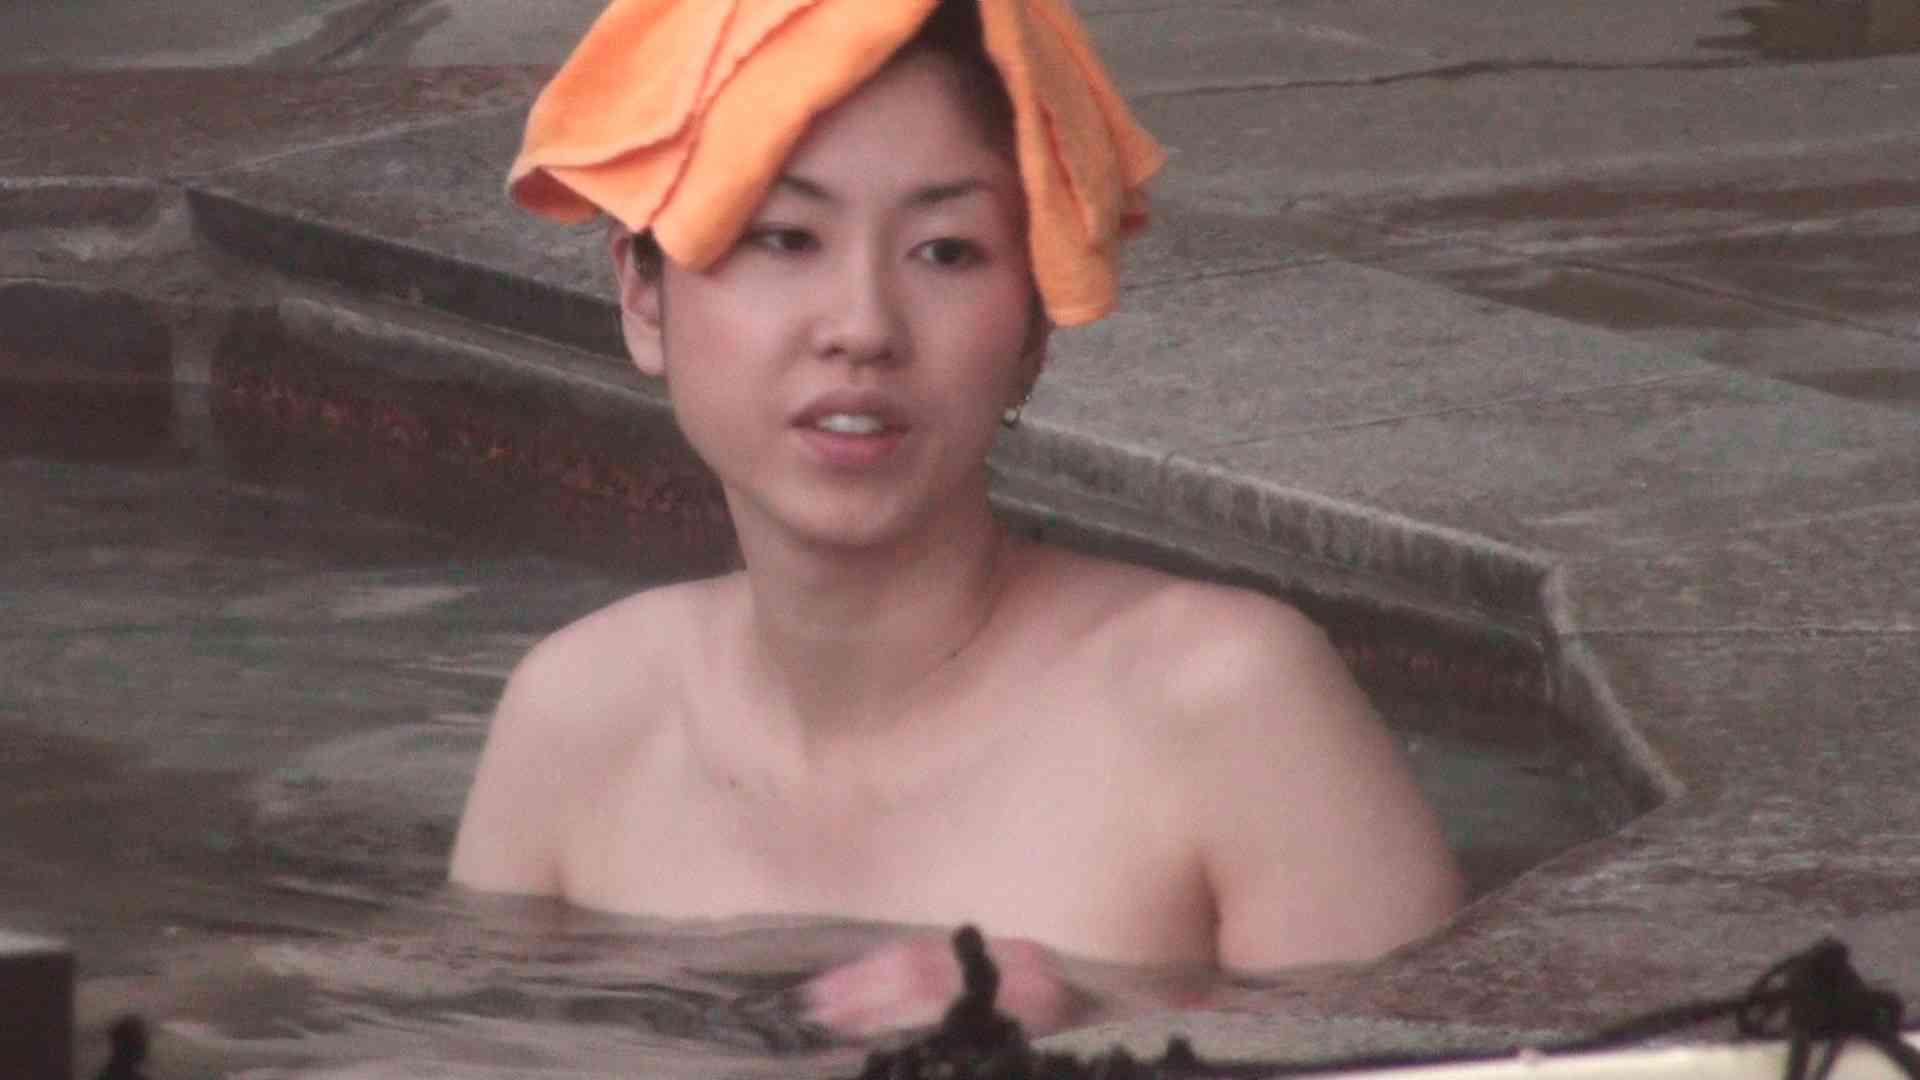 Aquaな露天風呂Vol.135 盗撮師作品 | 露天風呂突入  105pic 55